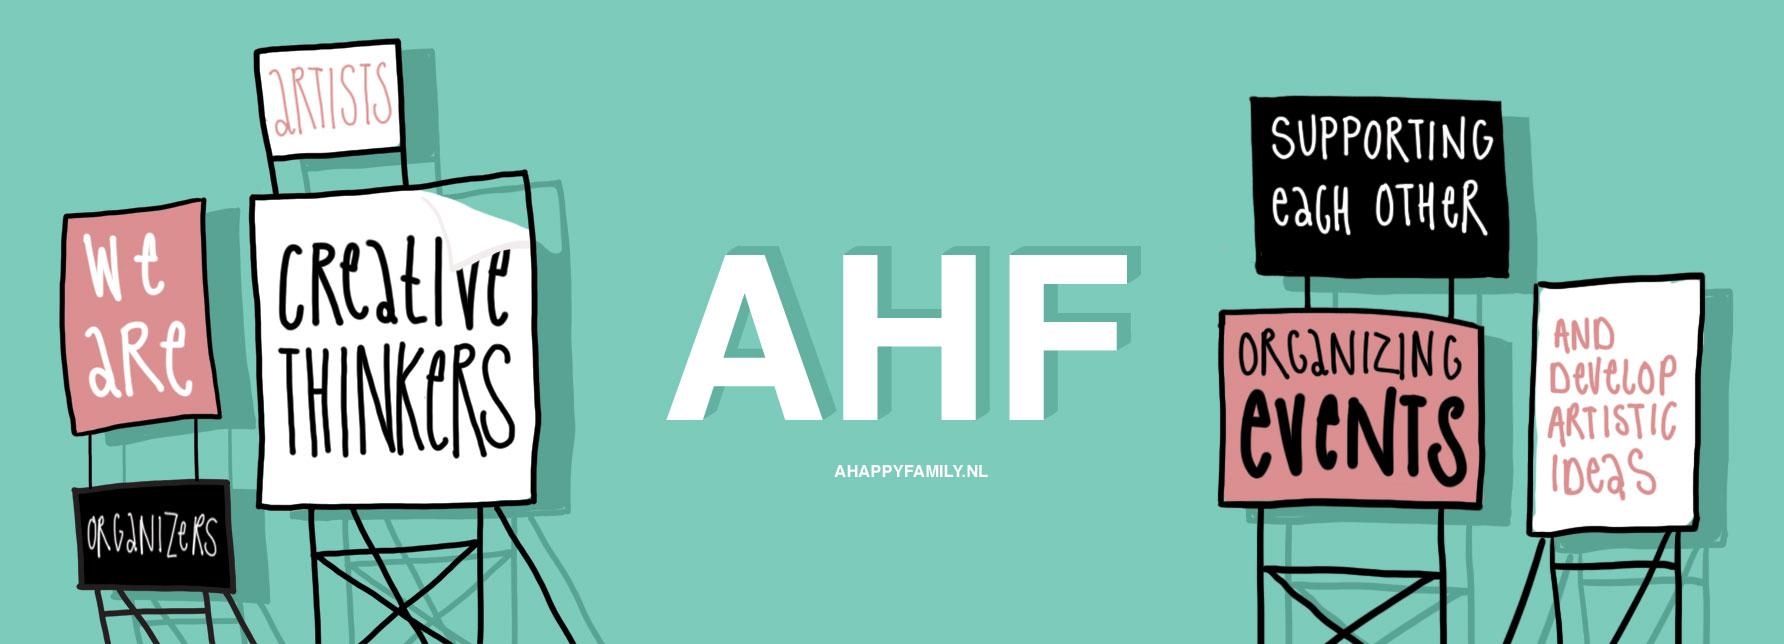 SAYING GOODBEY - Last year of AHF, 2017